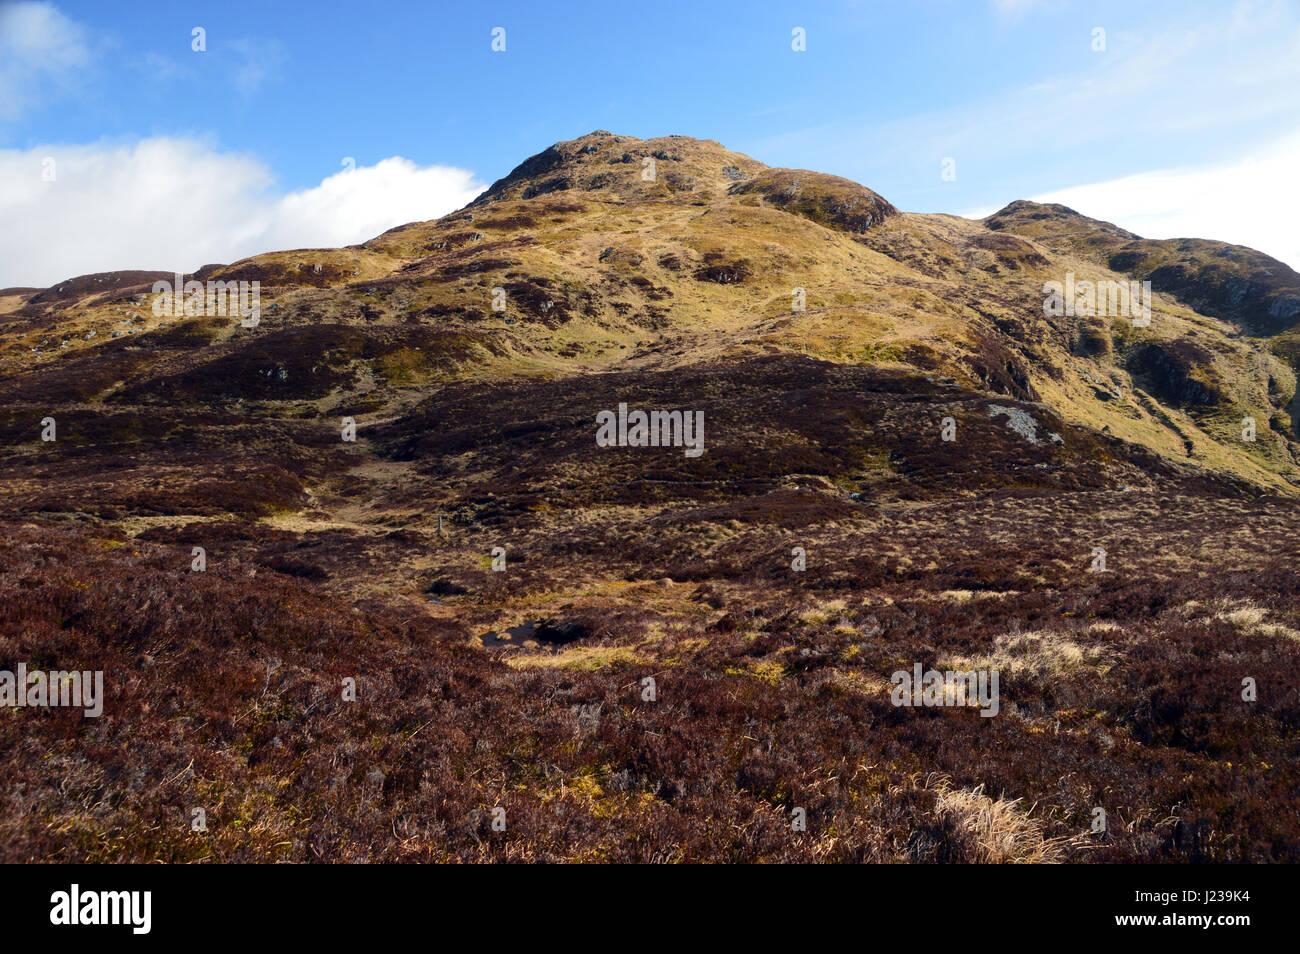 The Scottish Mountain Corbett Farragon Hill from near the Foss Barytes Mine Aberfeldy, Scottish Highlands. - Stock Image